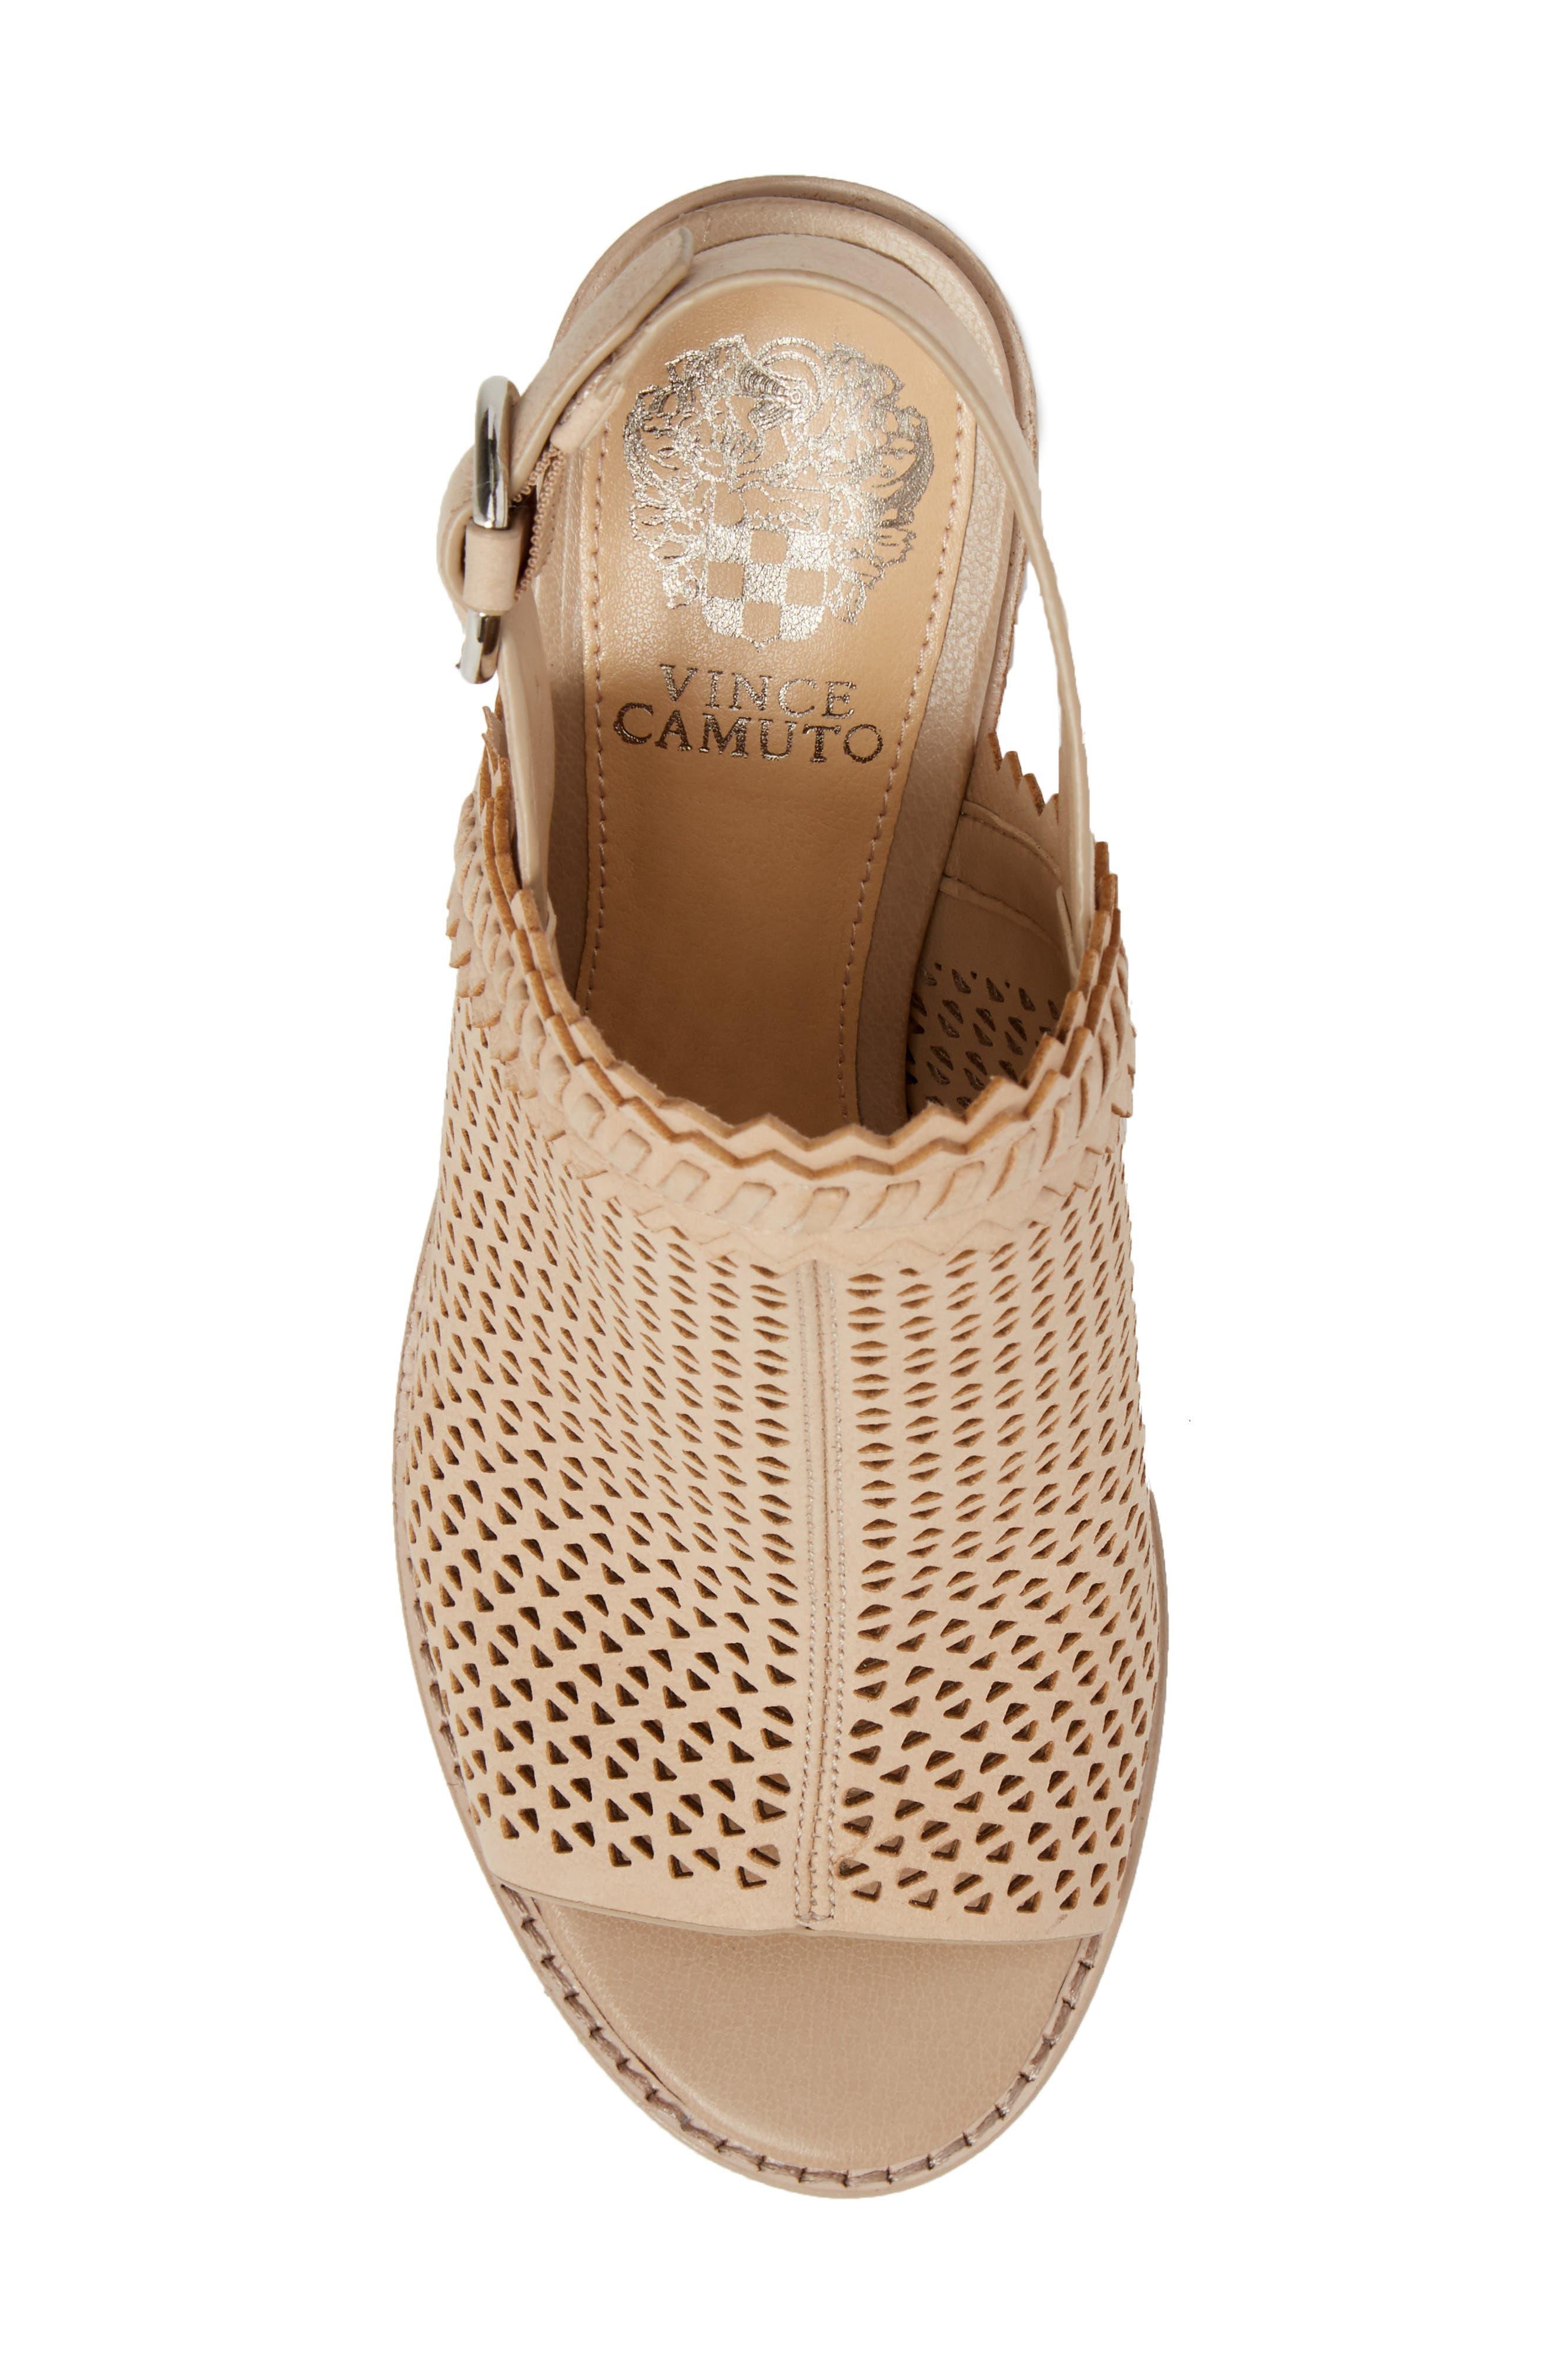 Tricinda Block Heel Sandal,                             Alternate thumbnail 5, color,                             SHELL LEATHER